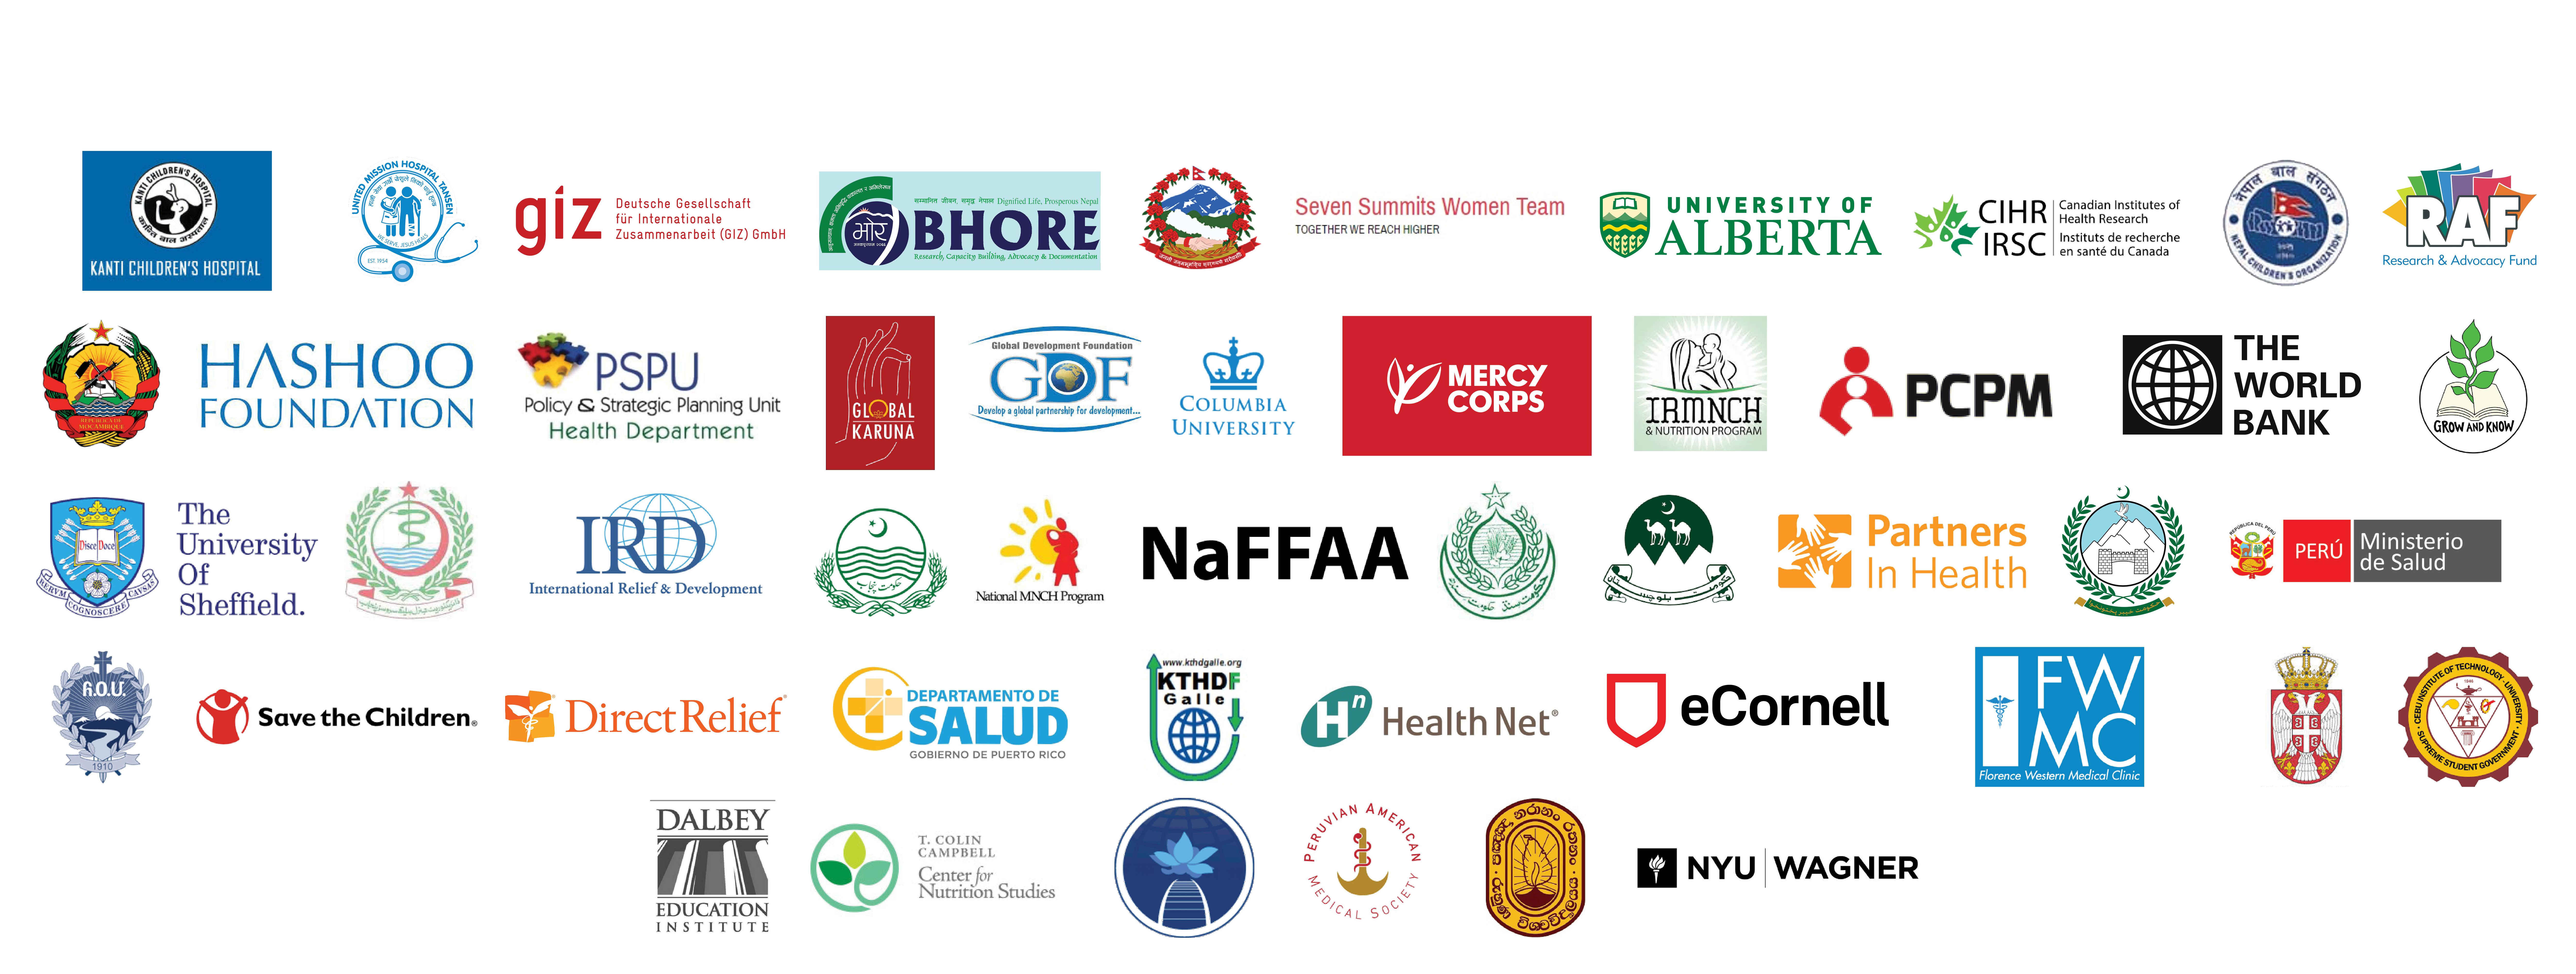 various logos of organizations and individuals supporting RMF